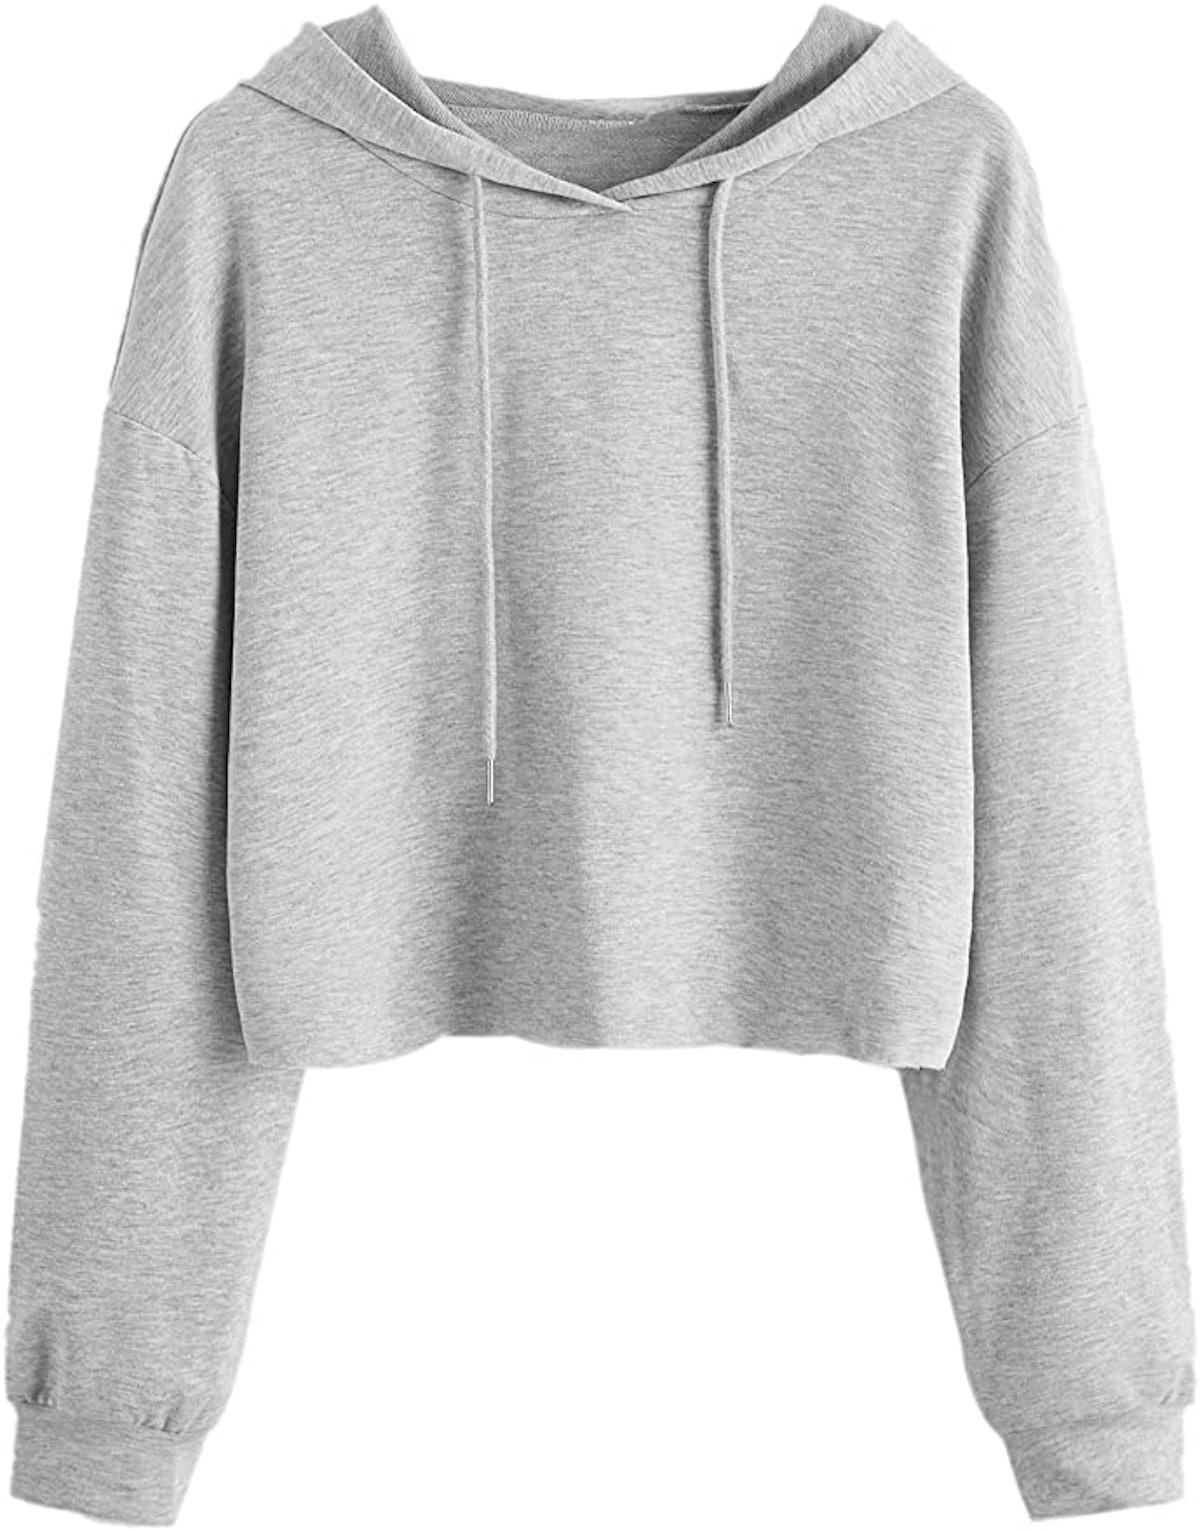 MAKEMECHIC Long Sleeve Crop Top Sweatshirt